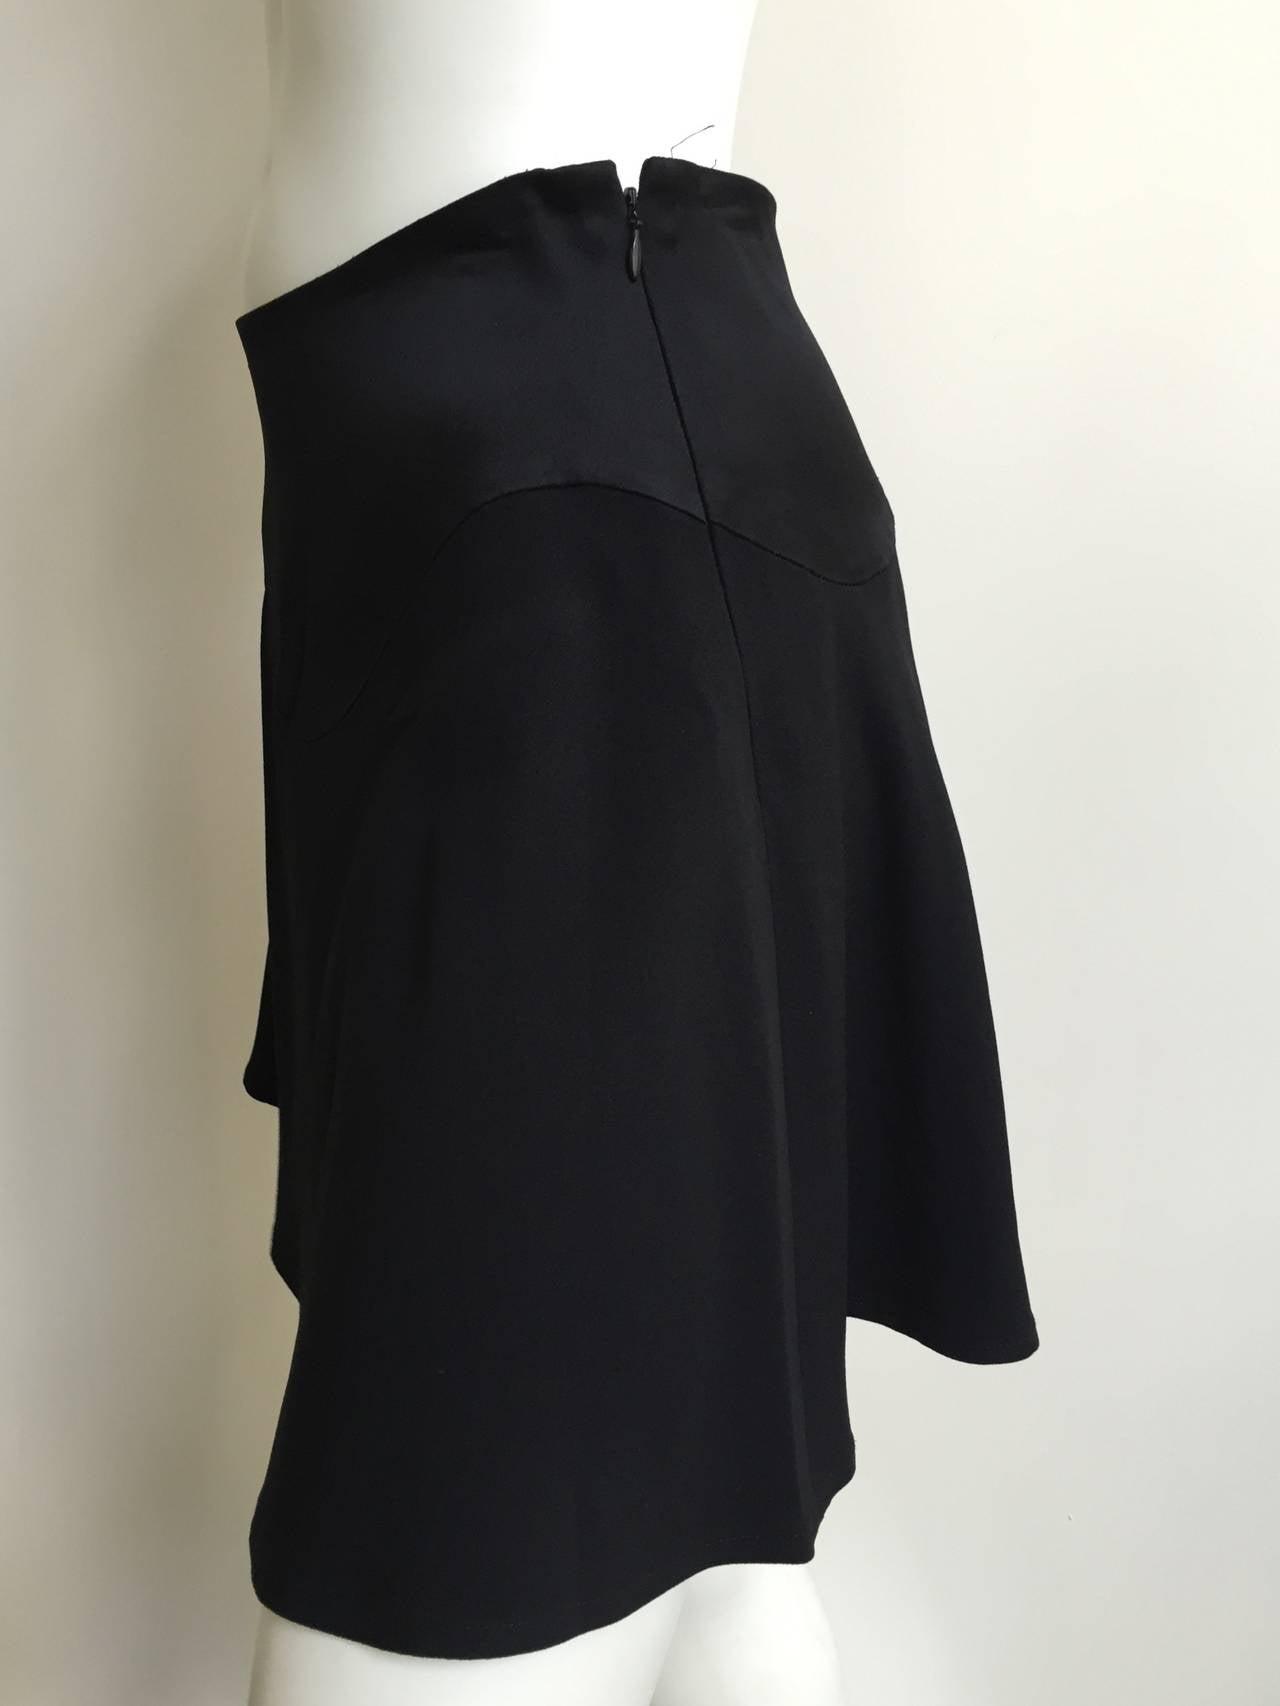 Moschino Black Short Skirt Size 6. 4